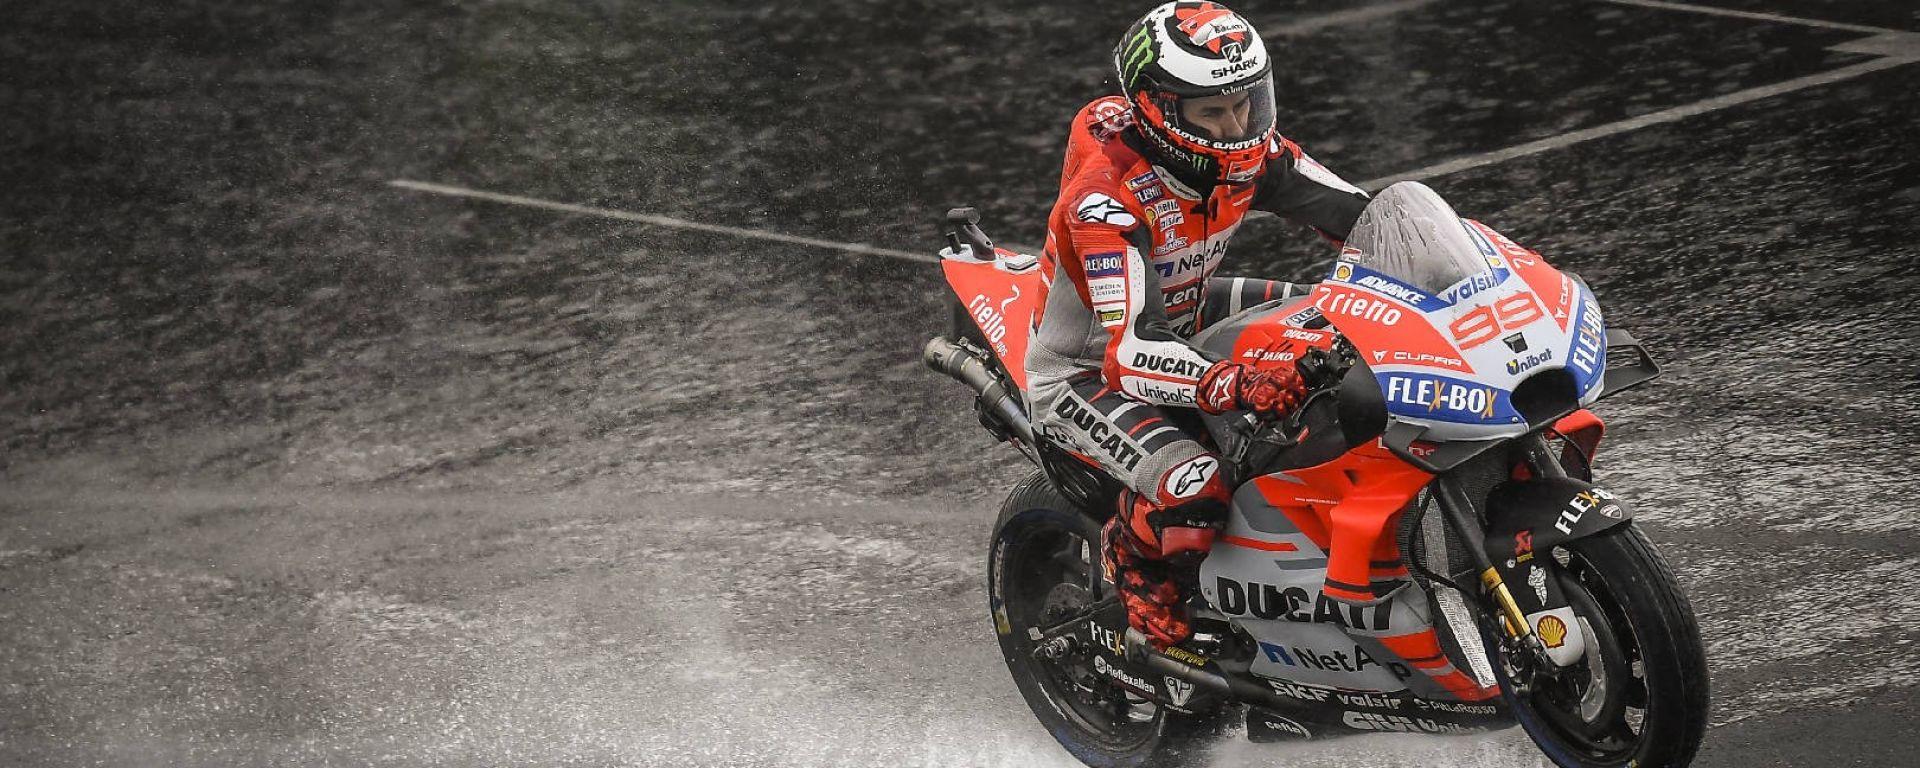 MotoGP Silverstone 2018: la gara anticipata alle 12.30